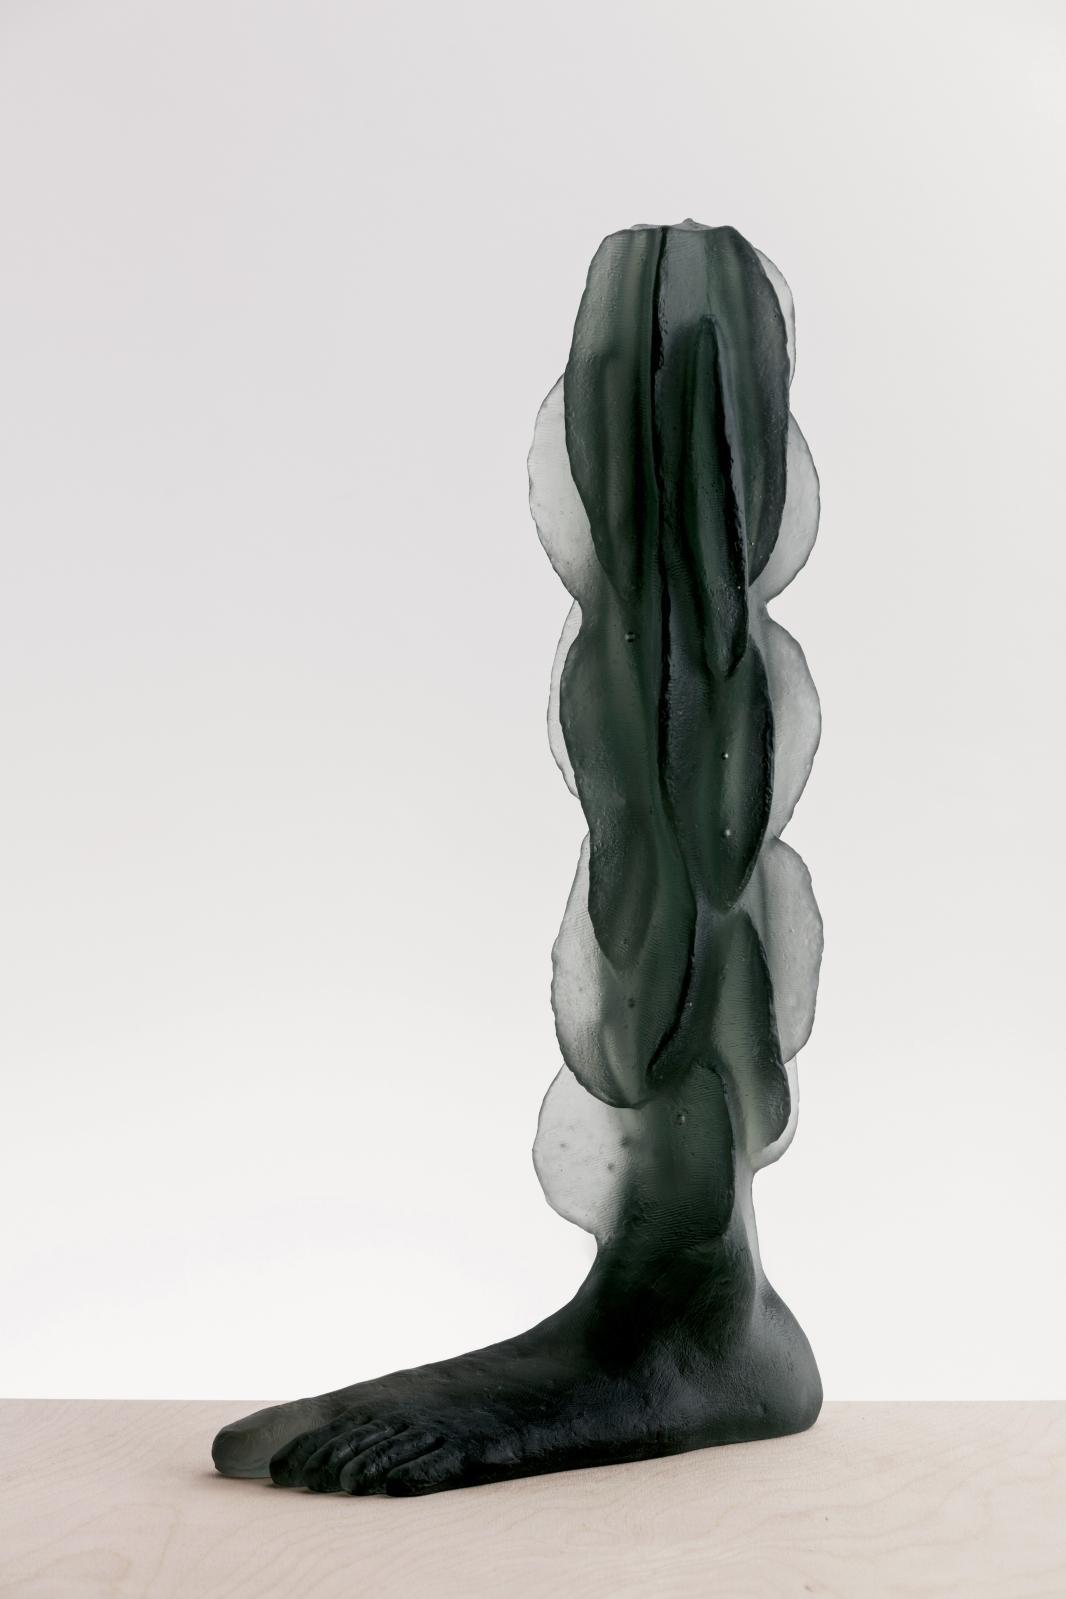 Lene Bødker (née en 1958), Foot on the Ground, 2013-1016, verre, 53,5x28,5x12cm